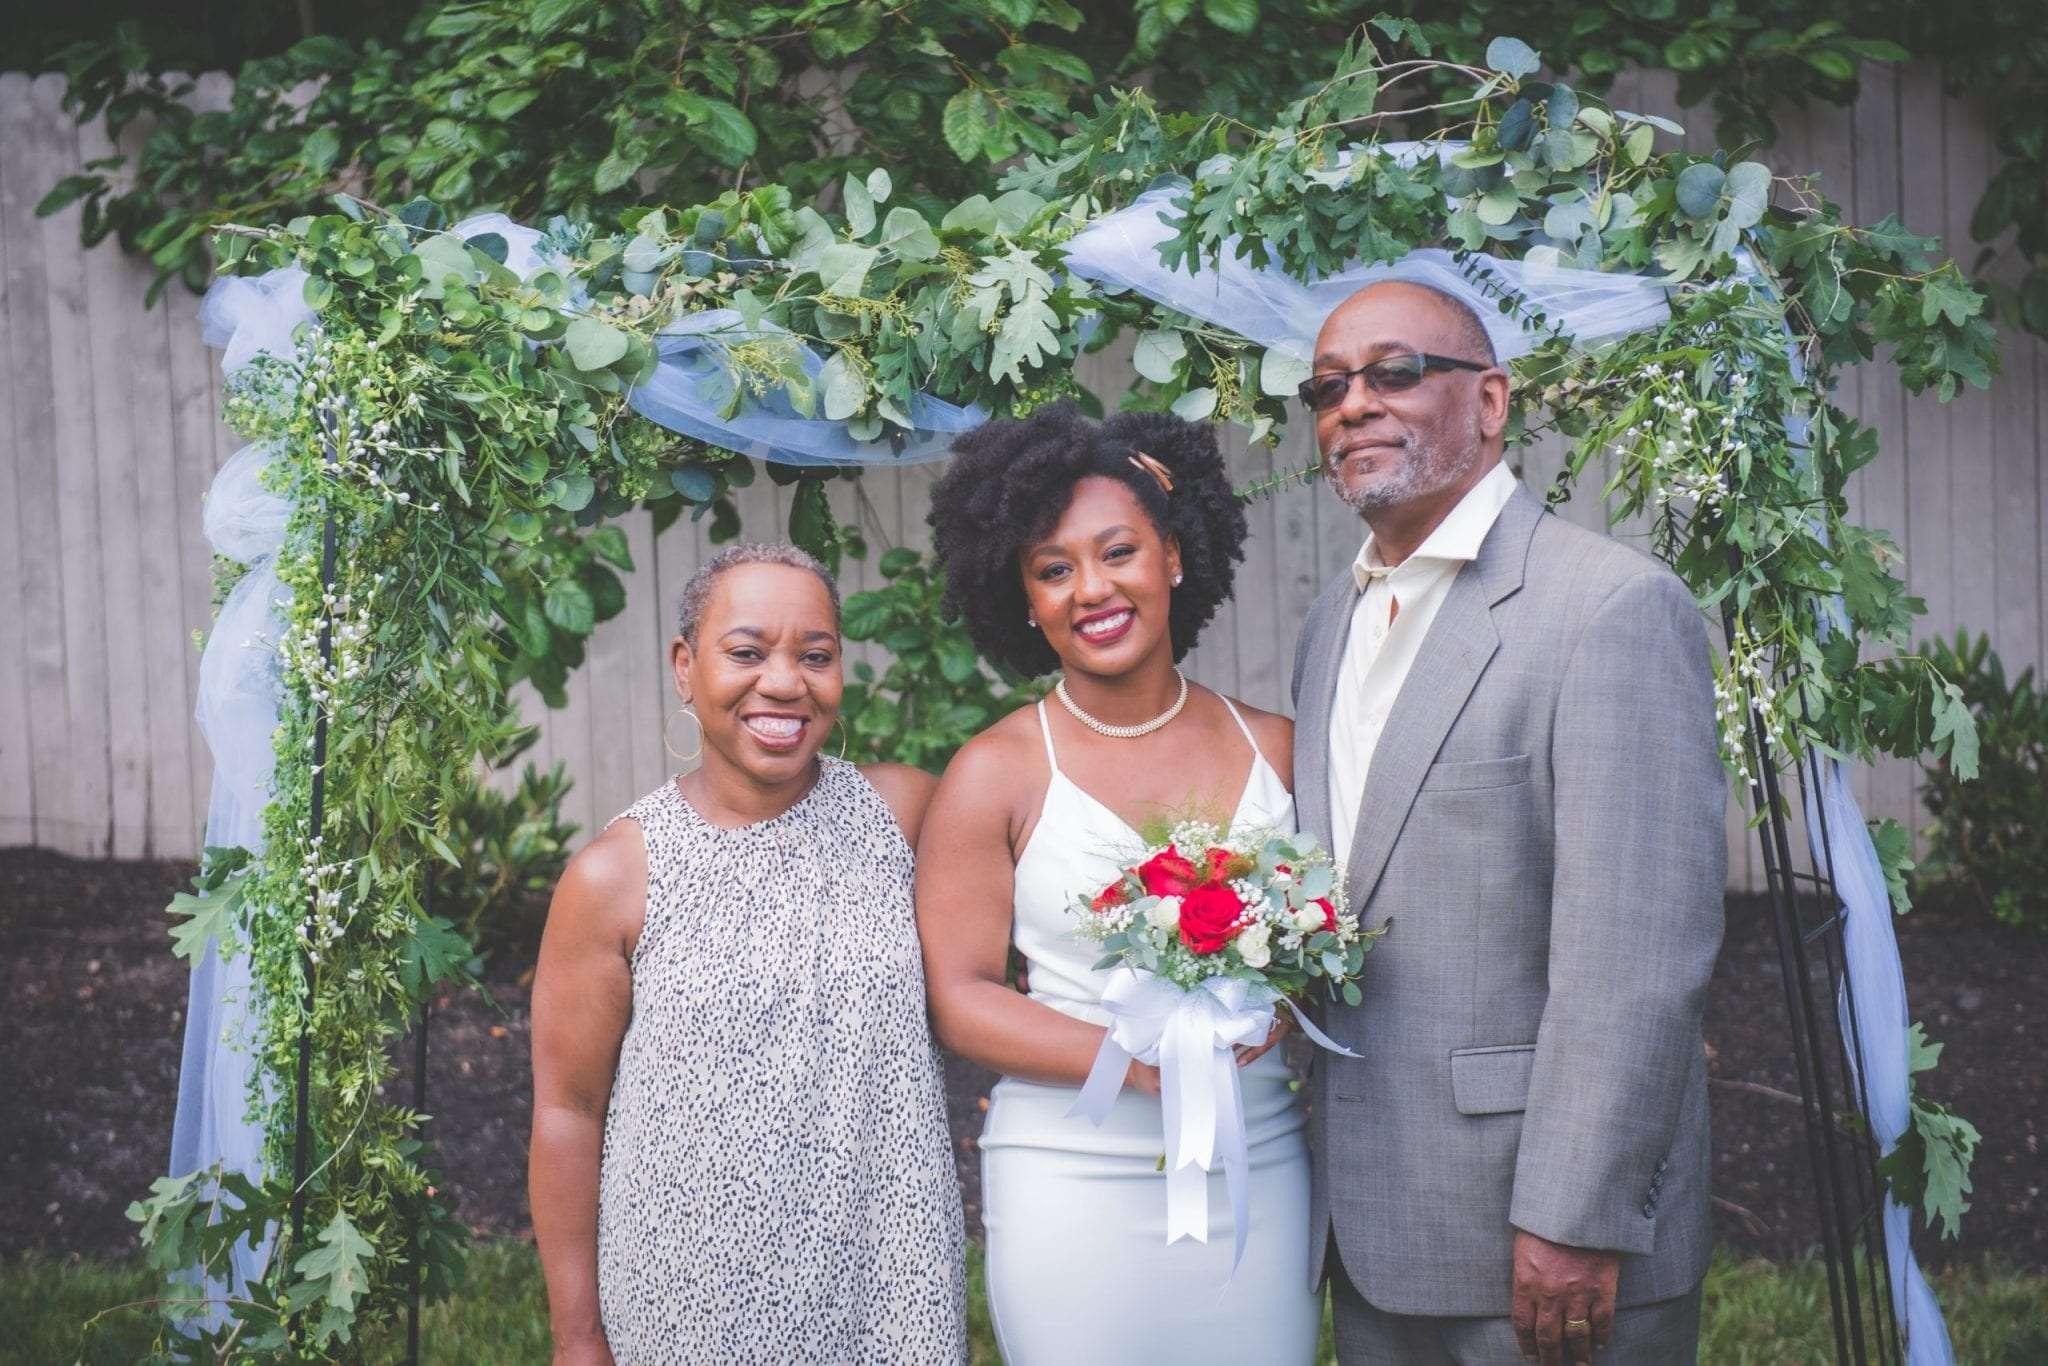 NJ backyard Micro wedding family portraits